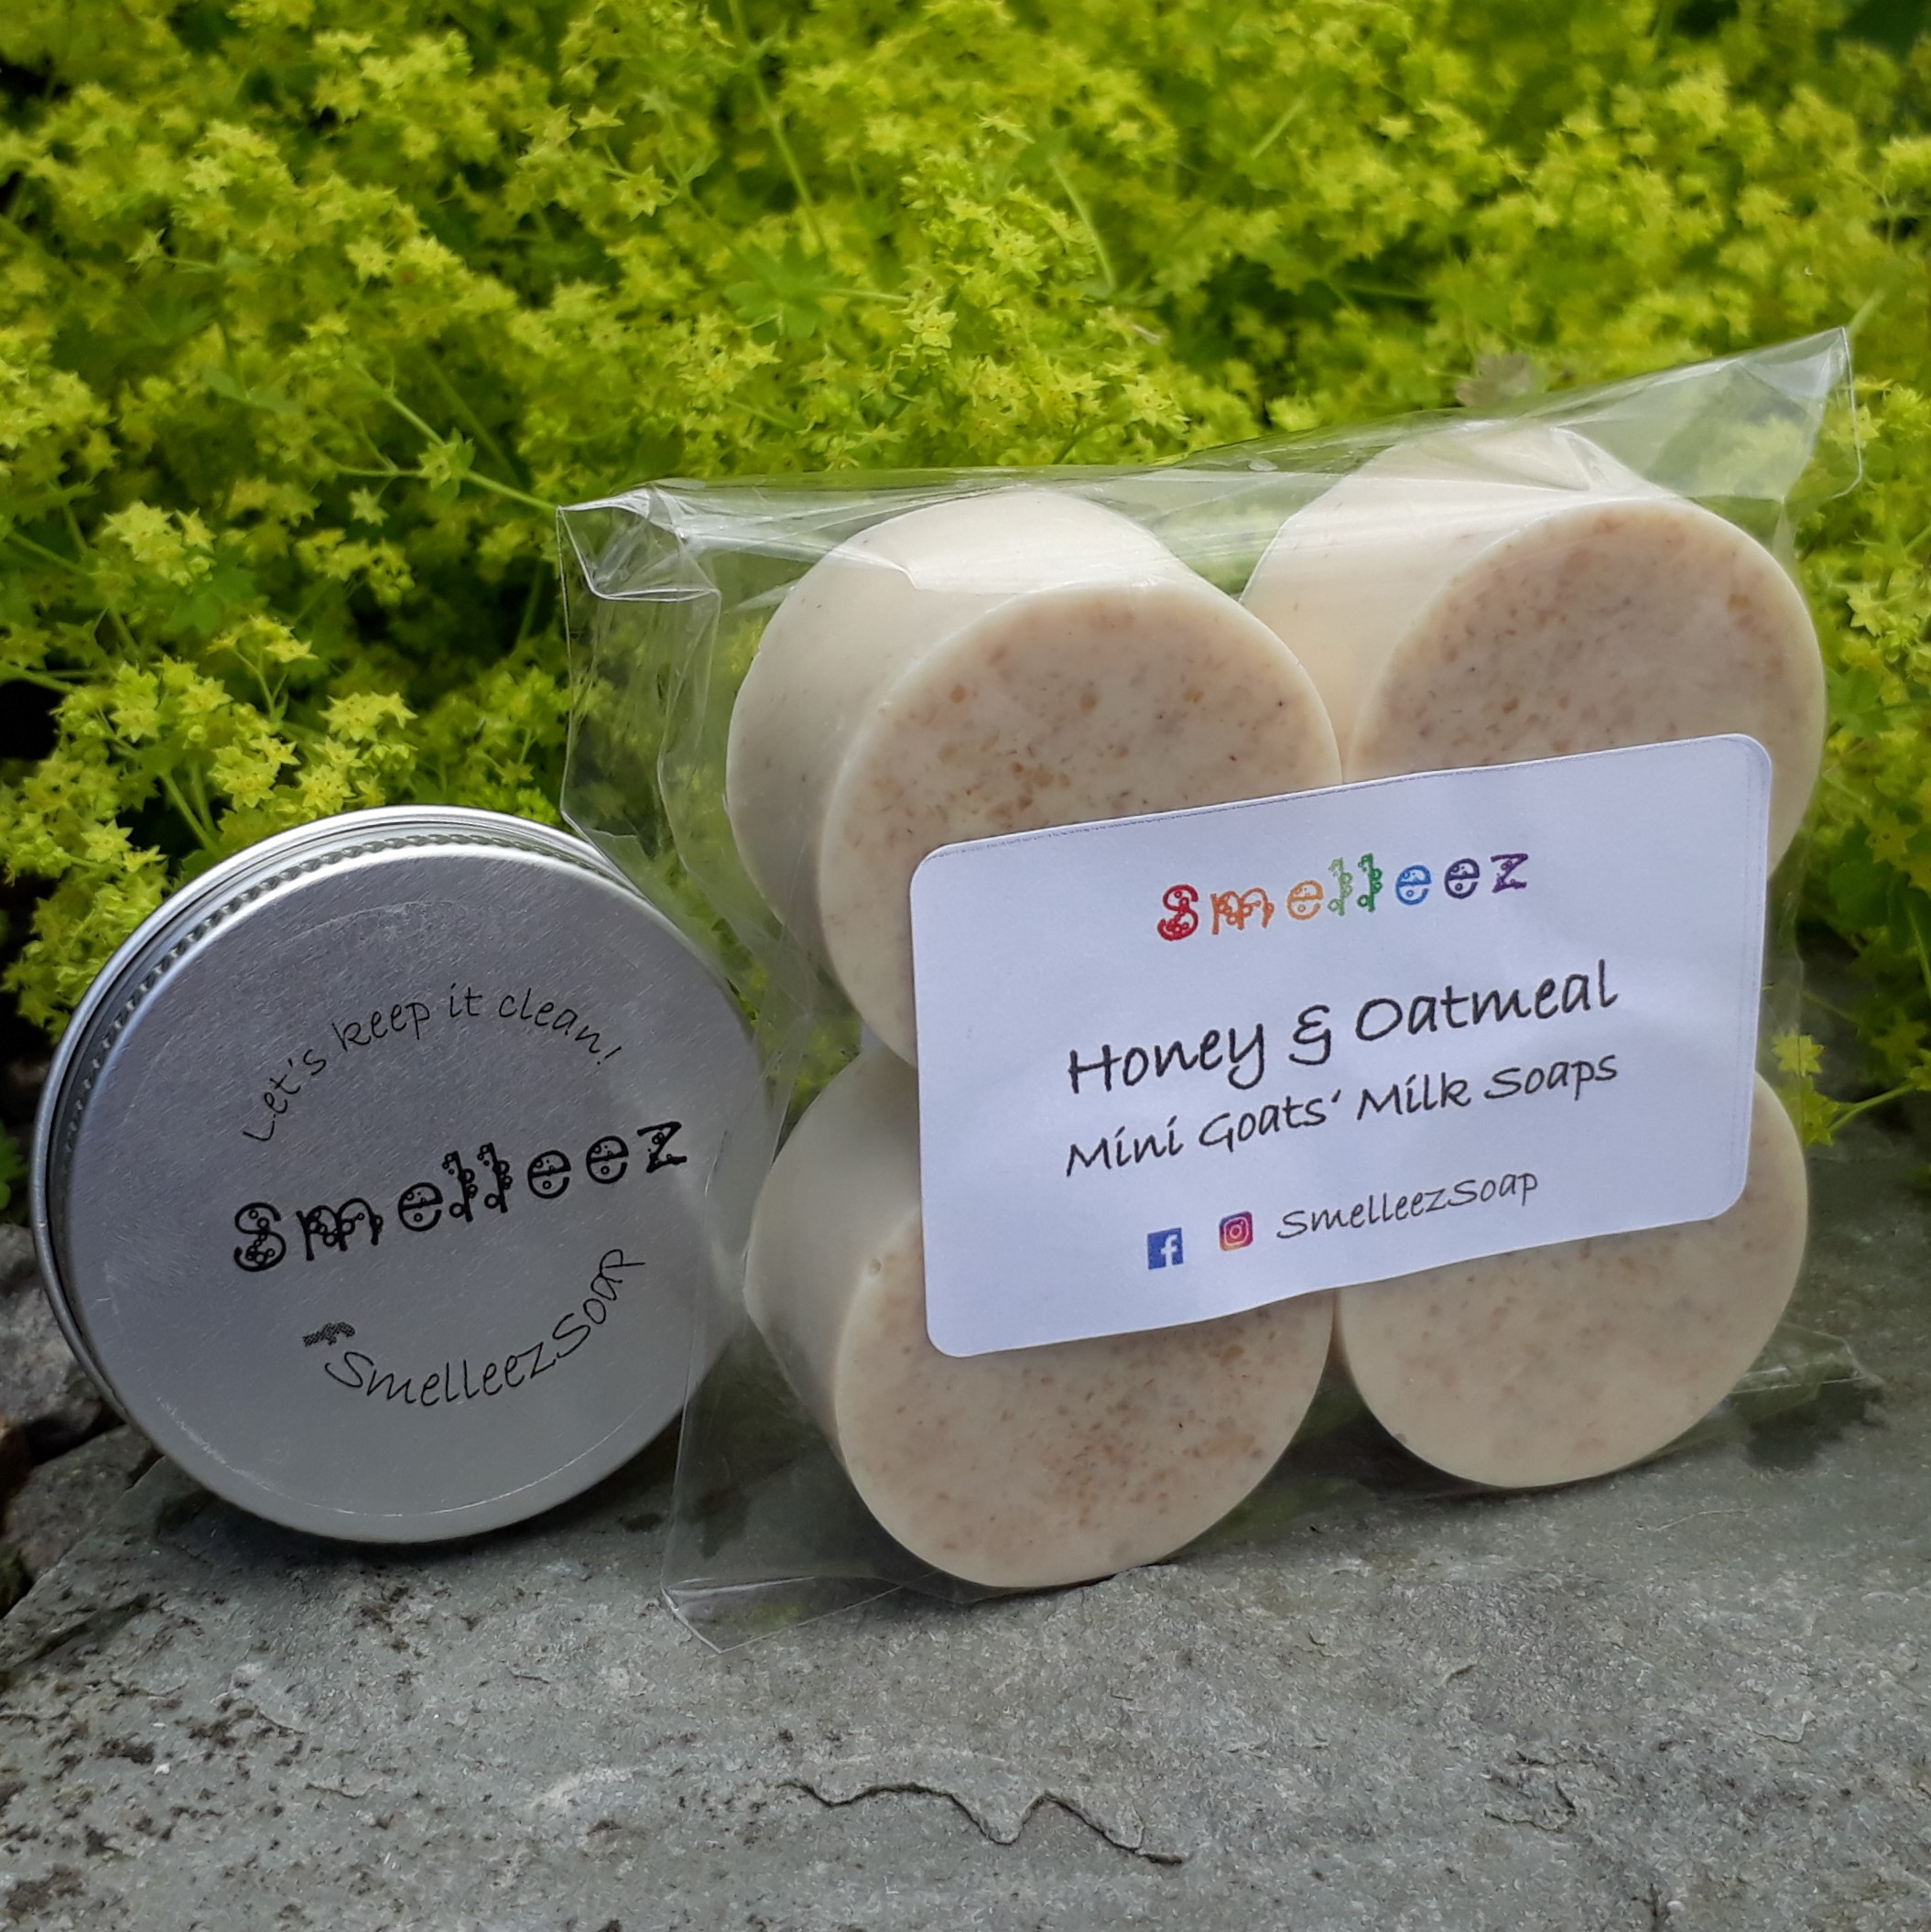 Mini Goats' Milk Soap Bars & Pocket Size Tin (Honey & Oatmeal)